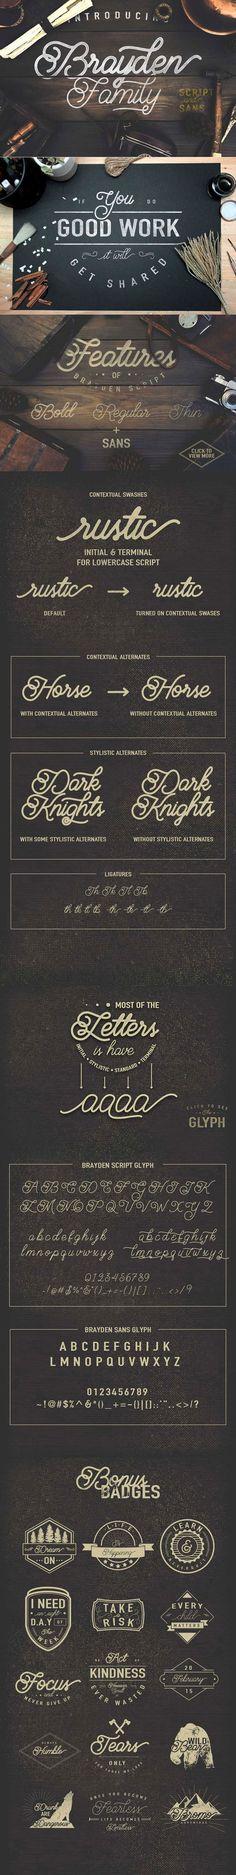 Brayden - a new vintage-style script font.: